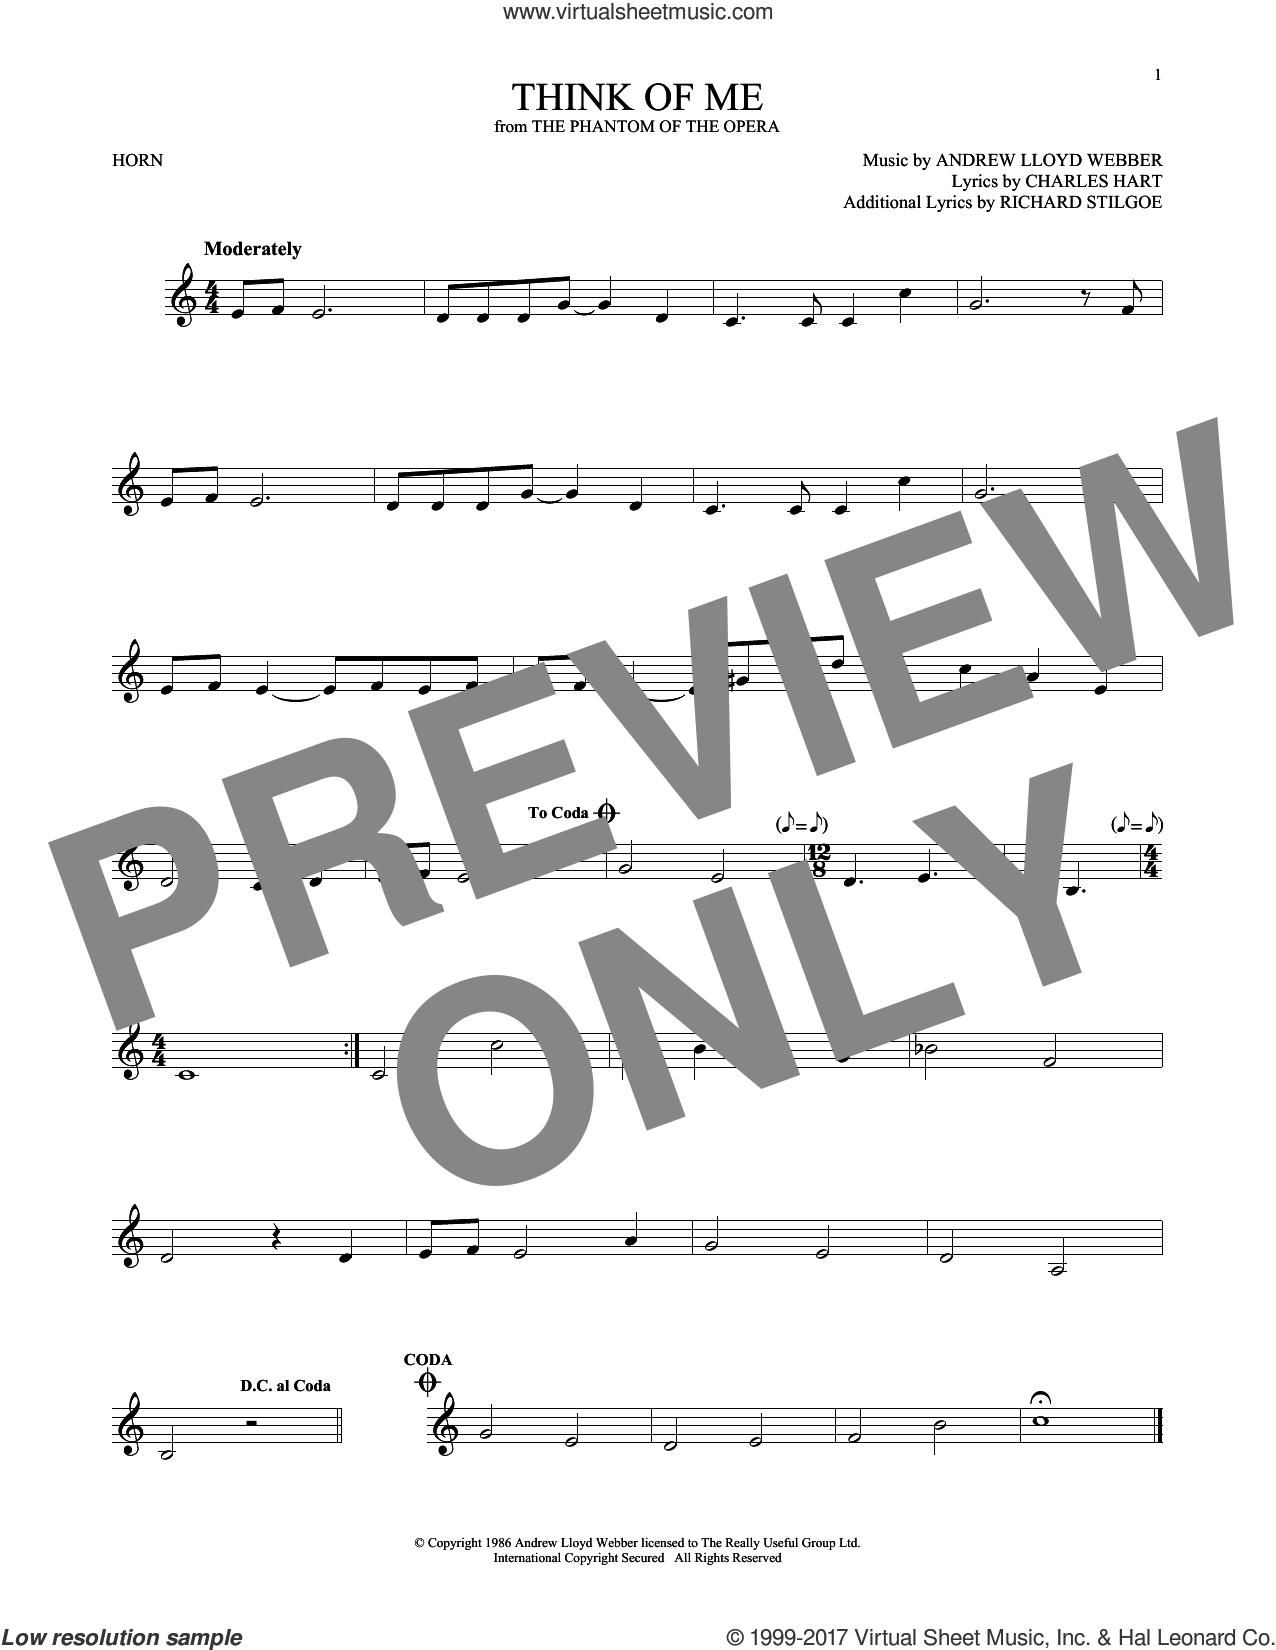 Think Of Me (from The Phantom Of The Opera) sheet music for horn solo by Andrew Lloyd Webber, Charles Hart and Richard Stilgoe, intermediate skill level